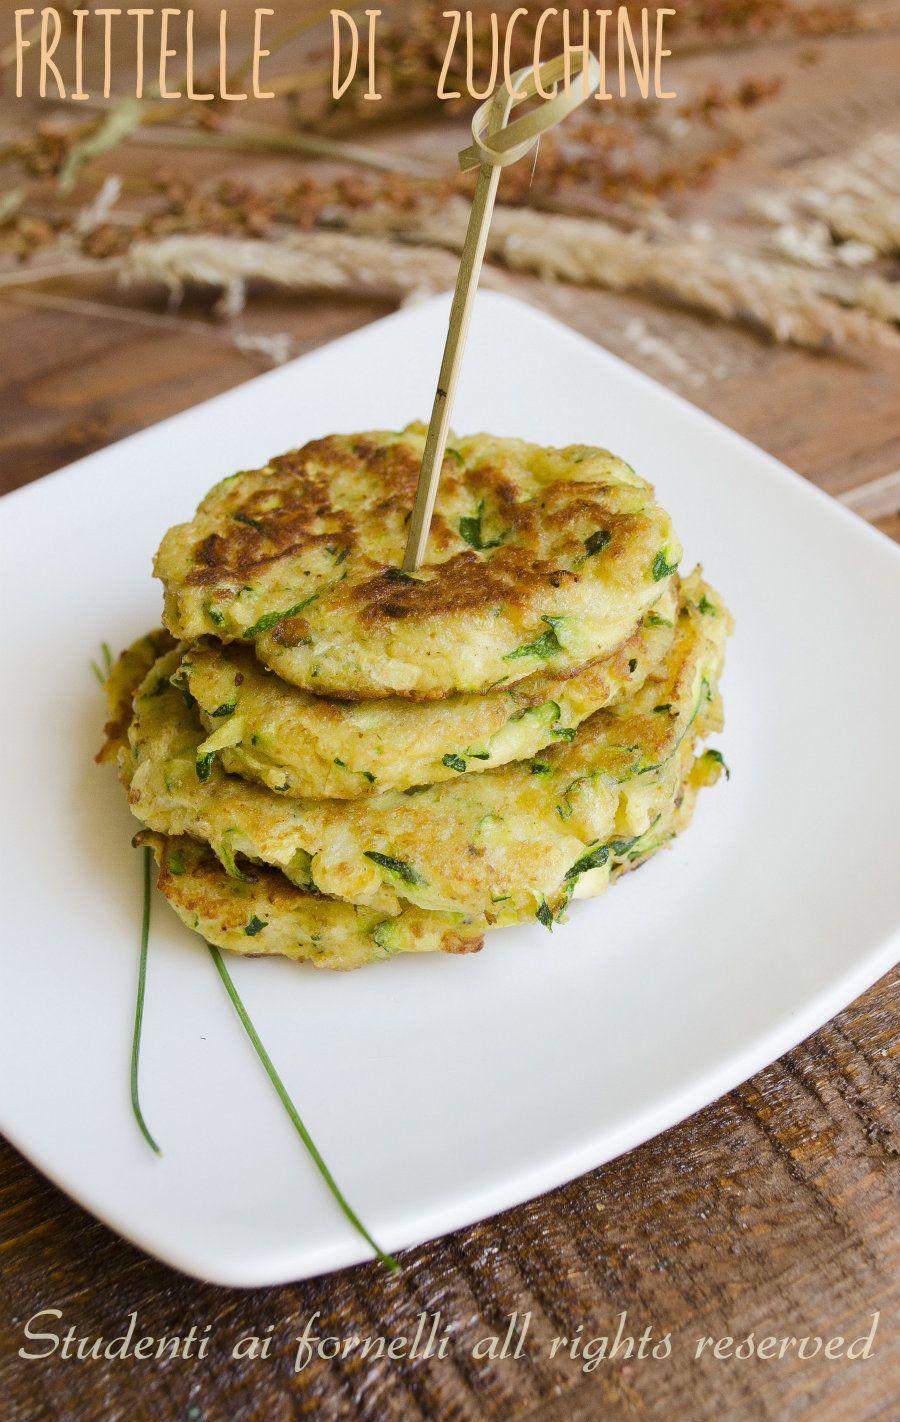 Très Frittelle di zucchine leggere cotte in padella, ricetta sfiziosa  SI84